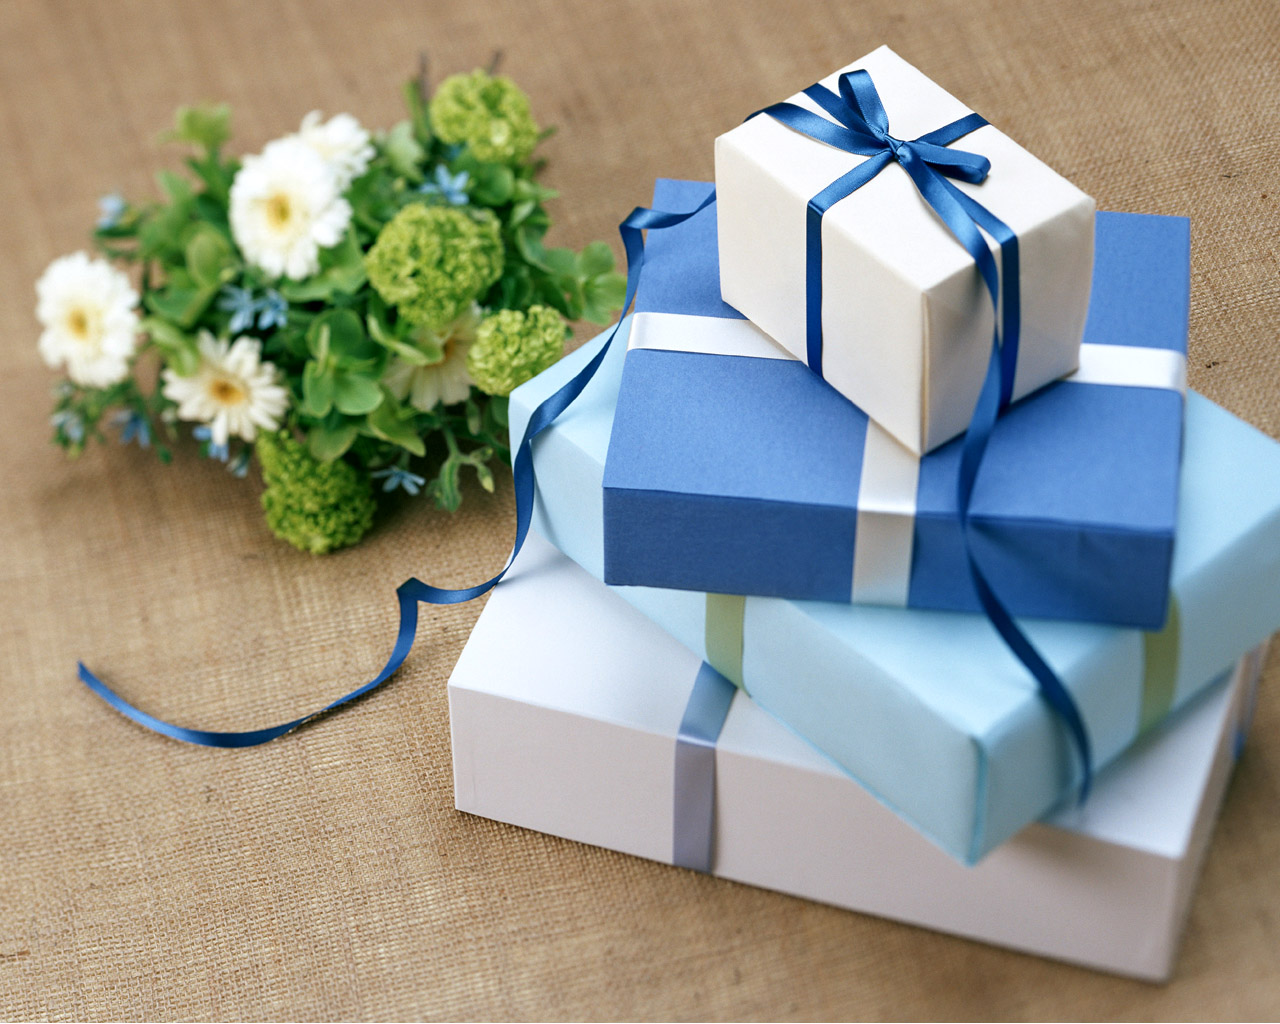 Gift-Cube-HD-Wallpaper.jpg